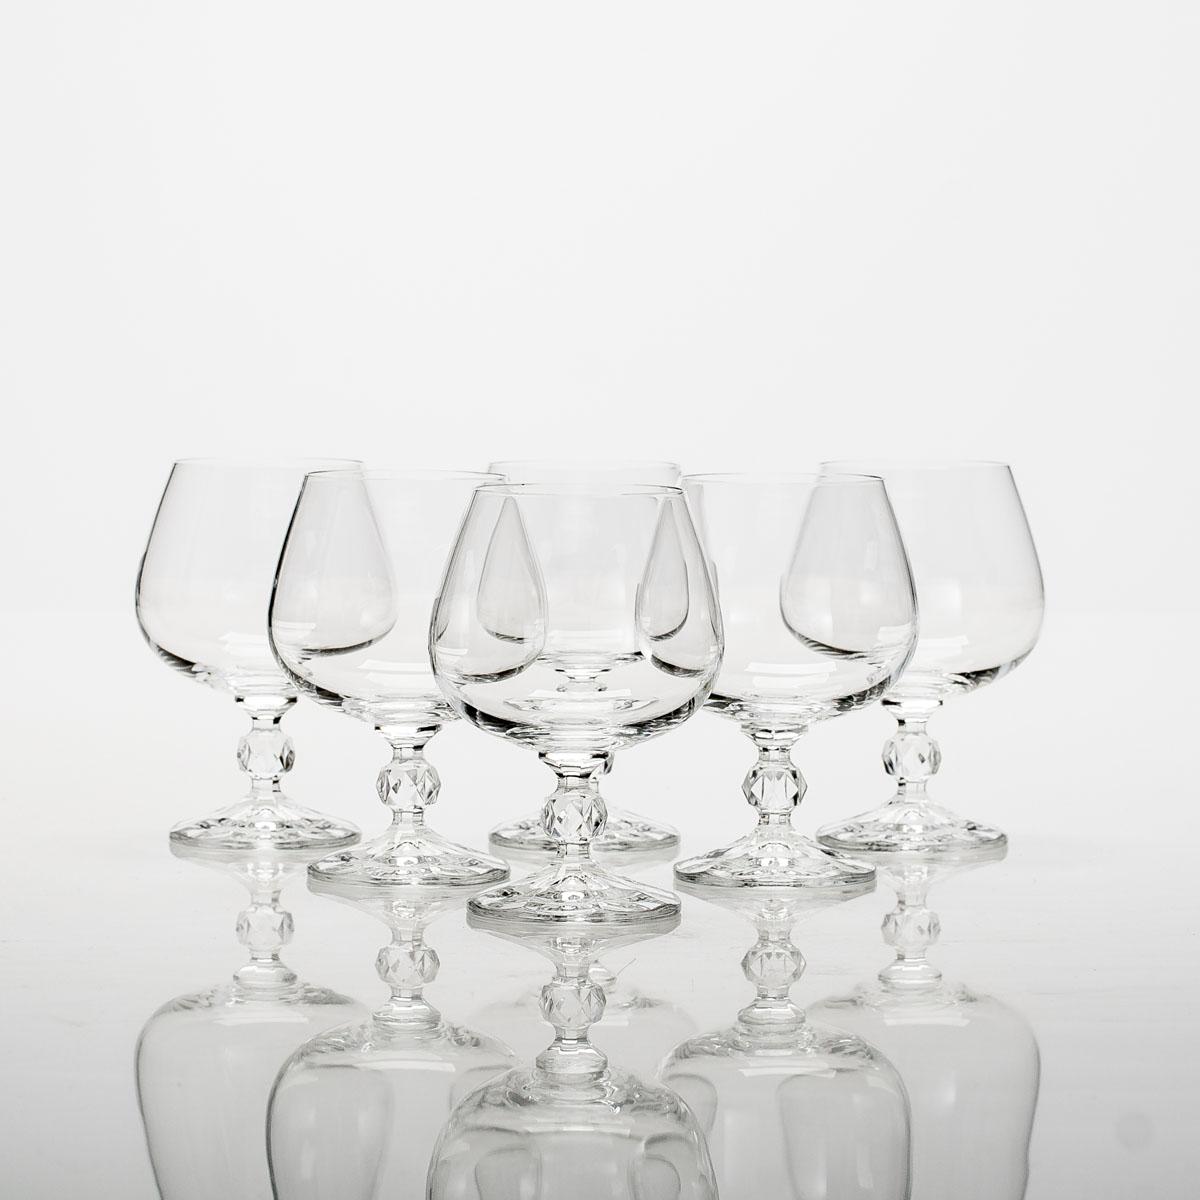 Набор бокалов для коньяка Crystalite Bohemia Klaudie, 250 мл, 6 шт набор бокалов для бренди 6 шт crystalite bohemia набор бокалов для бренди 6 шт